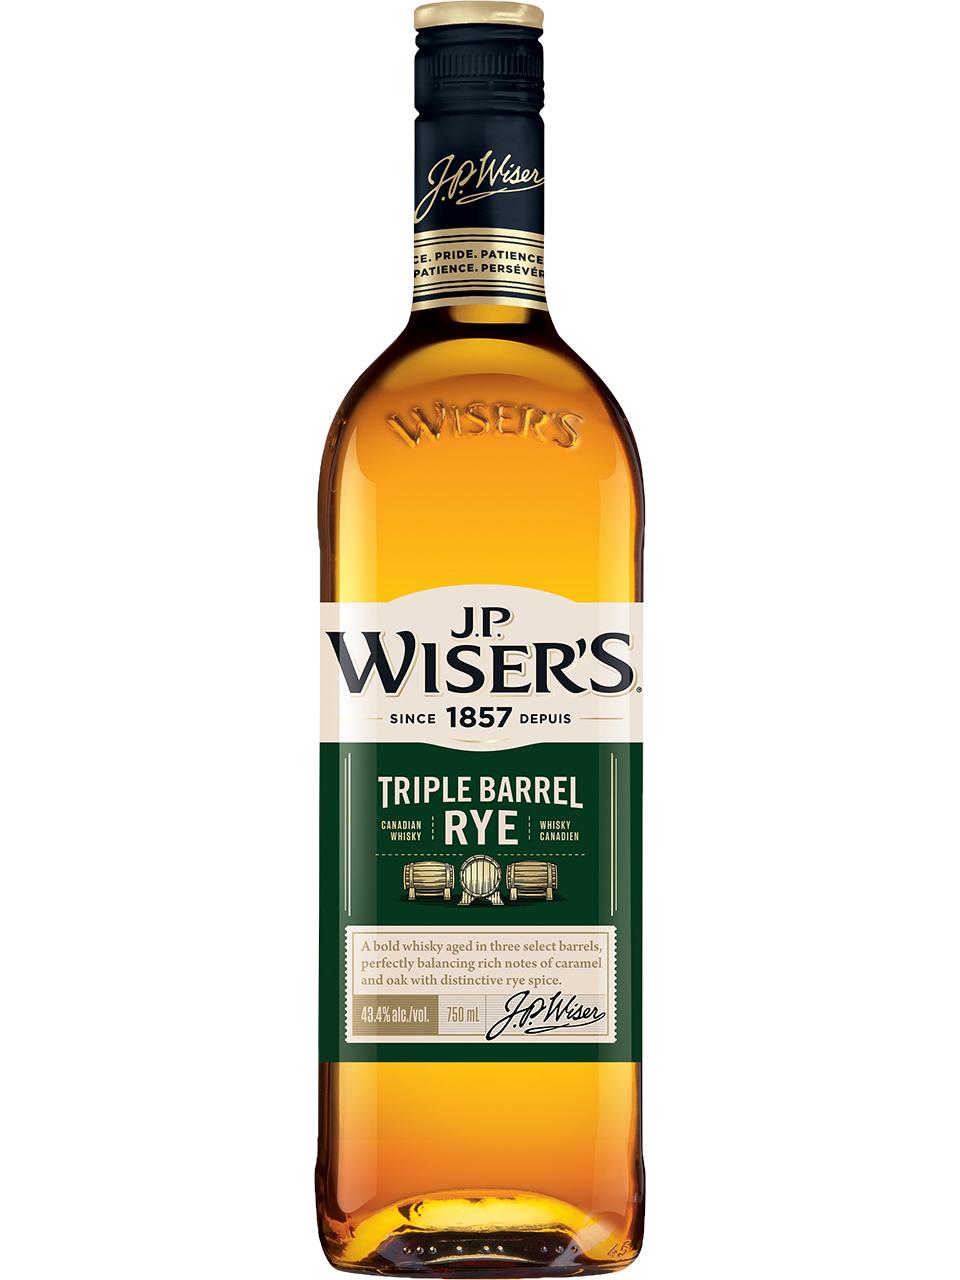 J.P. Wiser's Triple Barrel Rye Whisky